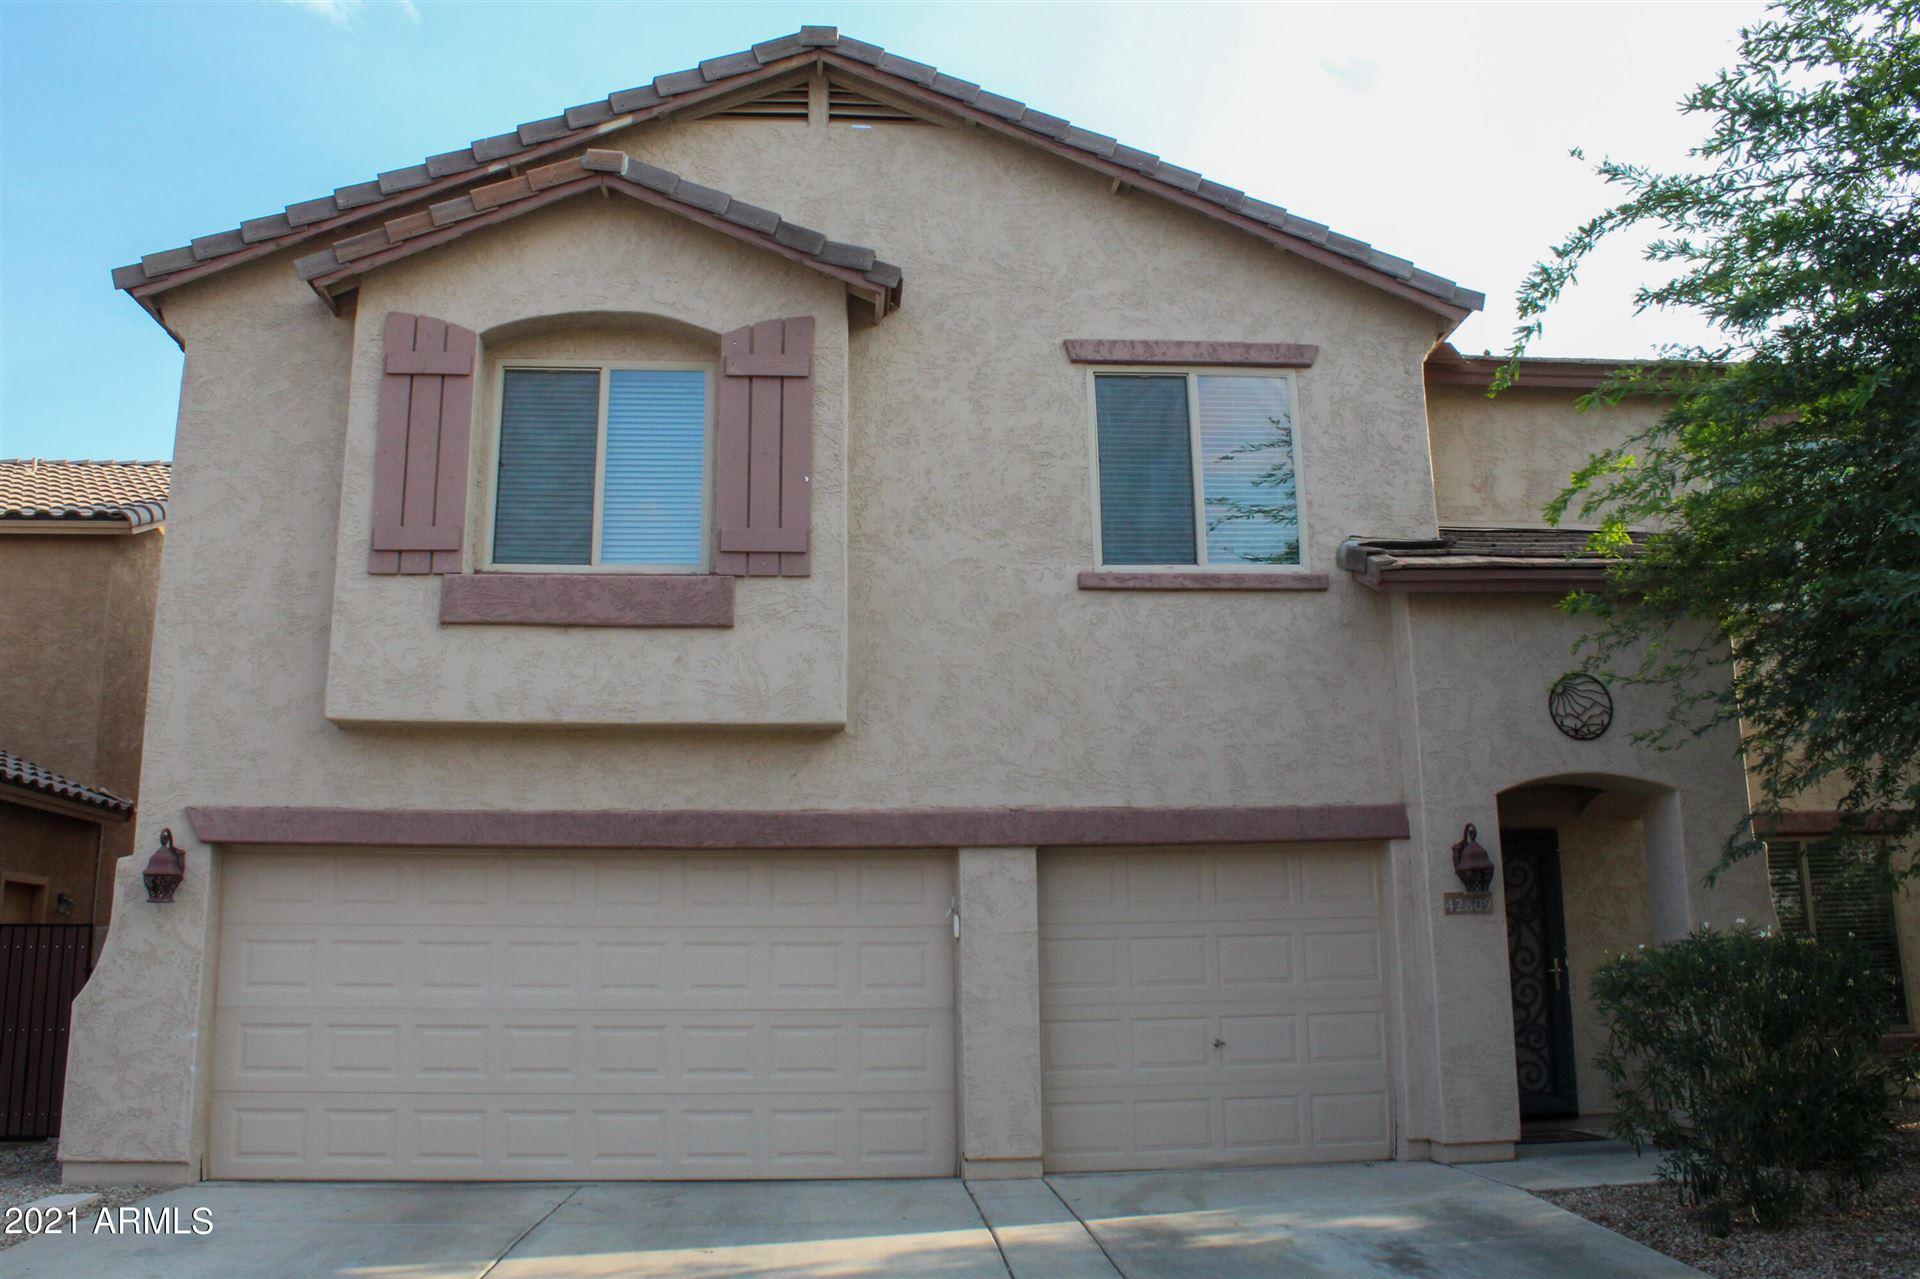 Photo for 42809 W KRISTAL Lane, Maricopa, AZ 85138 (MLS # 6277439)